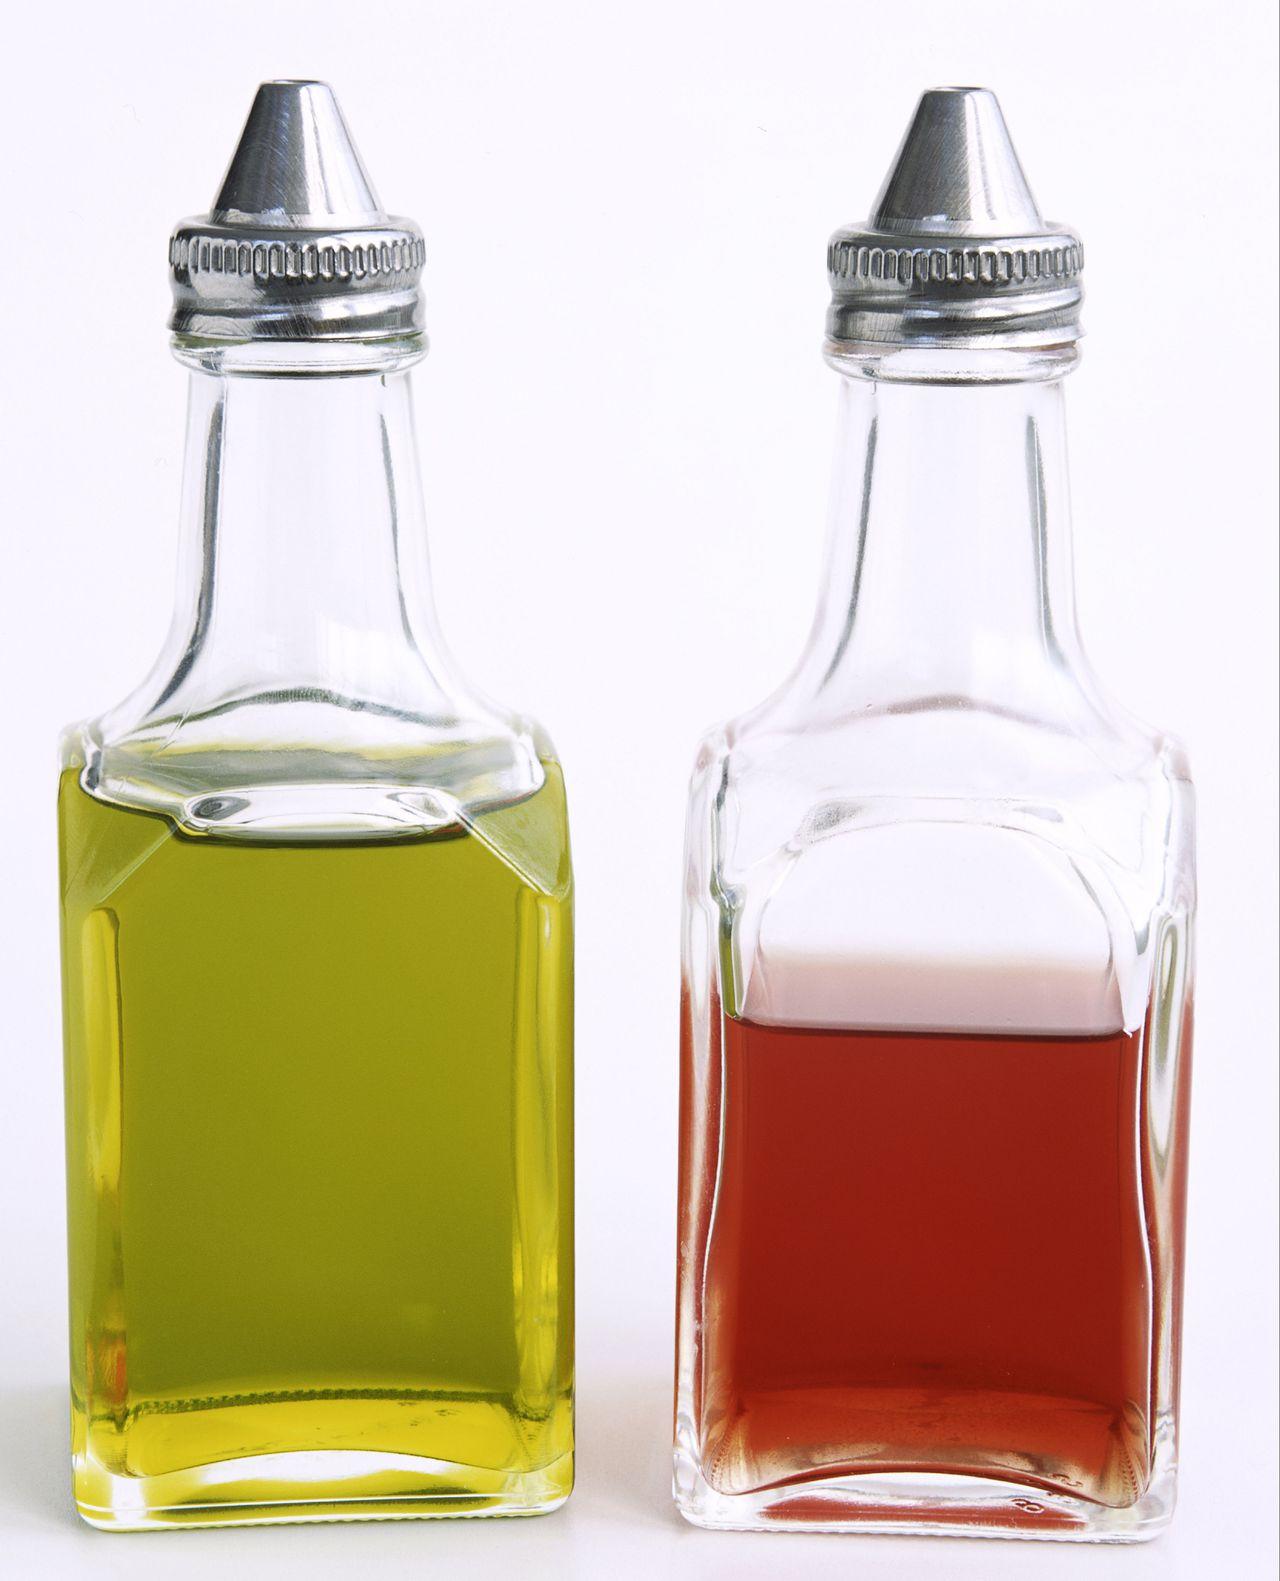 Olive Oil and Vinegar Cruets